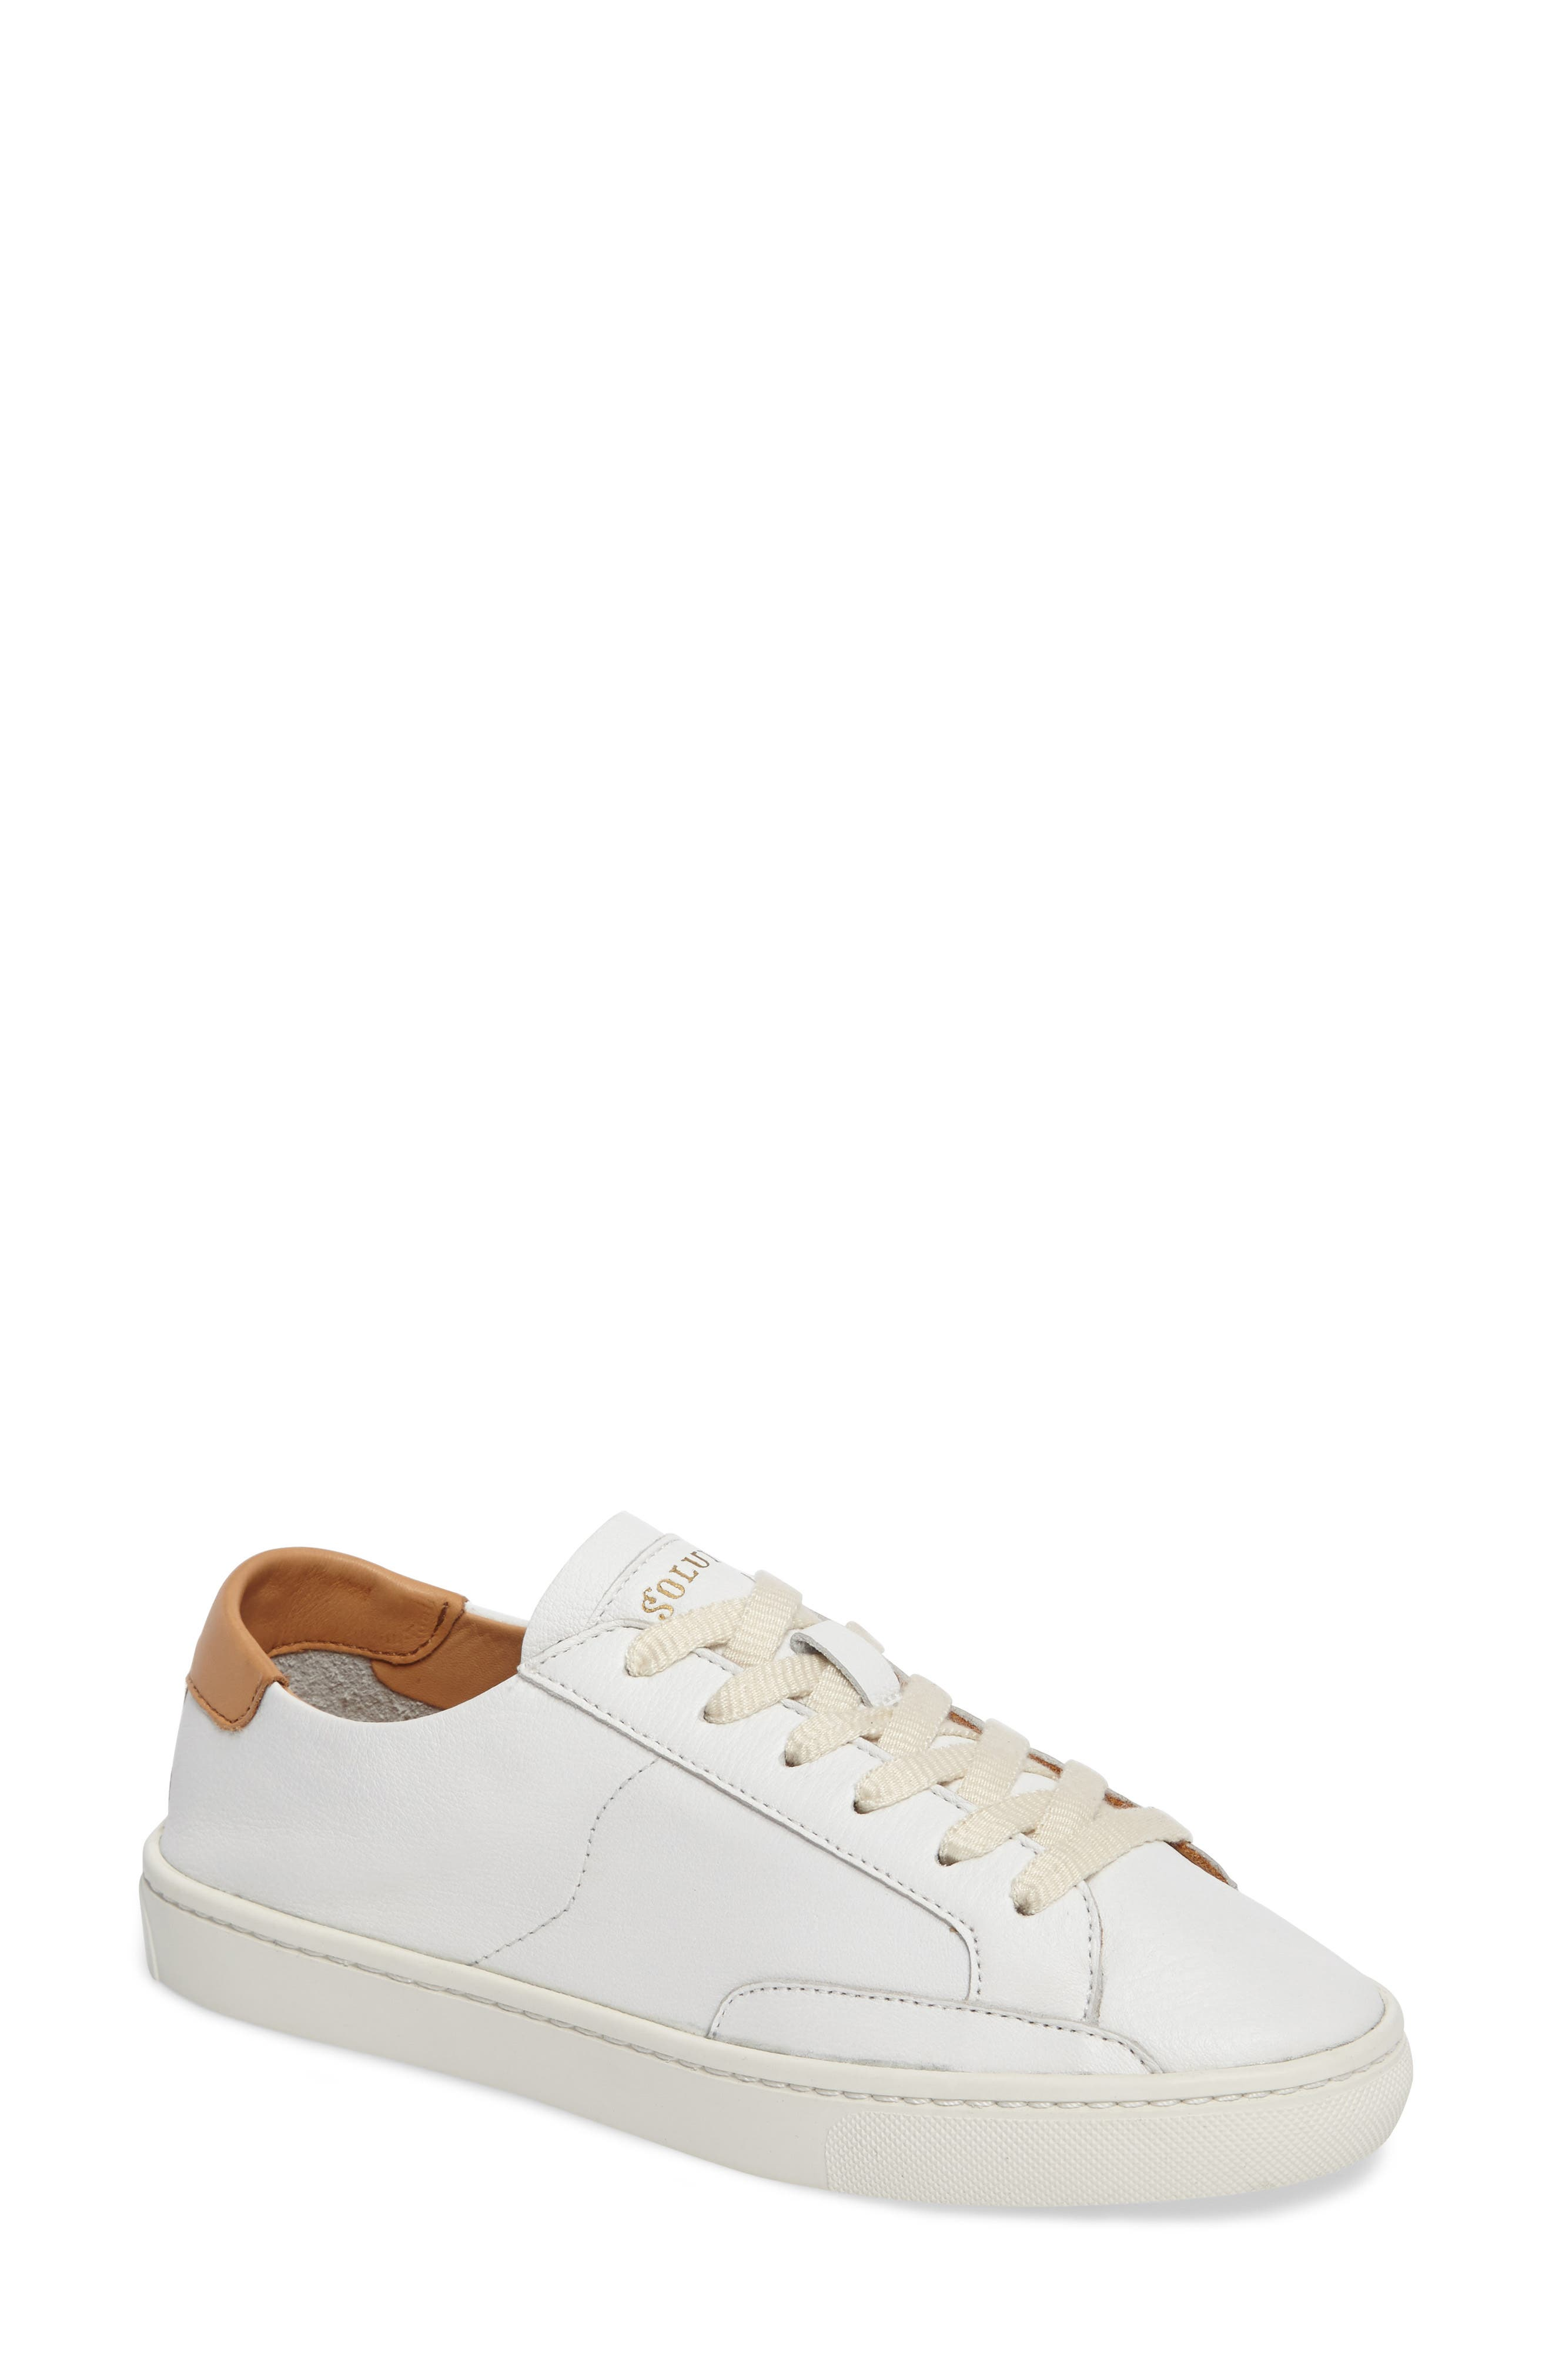 Ibiza Sneaker,                             Main thumbnail 1, color,                             White